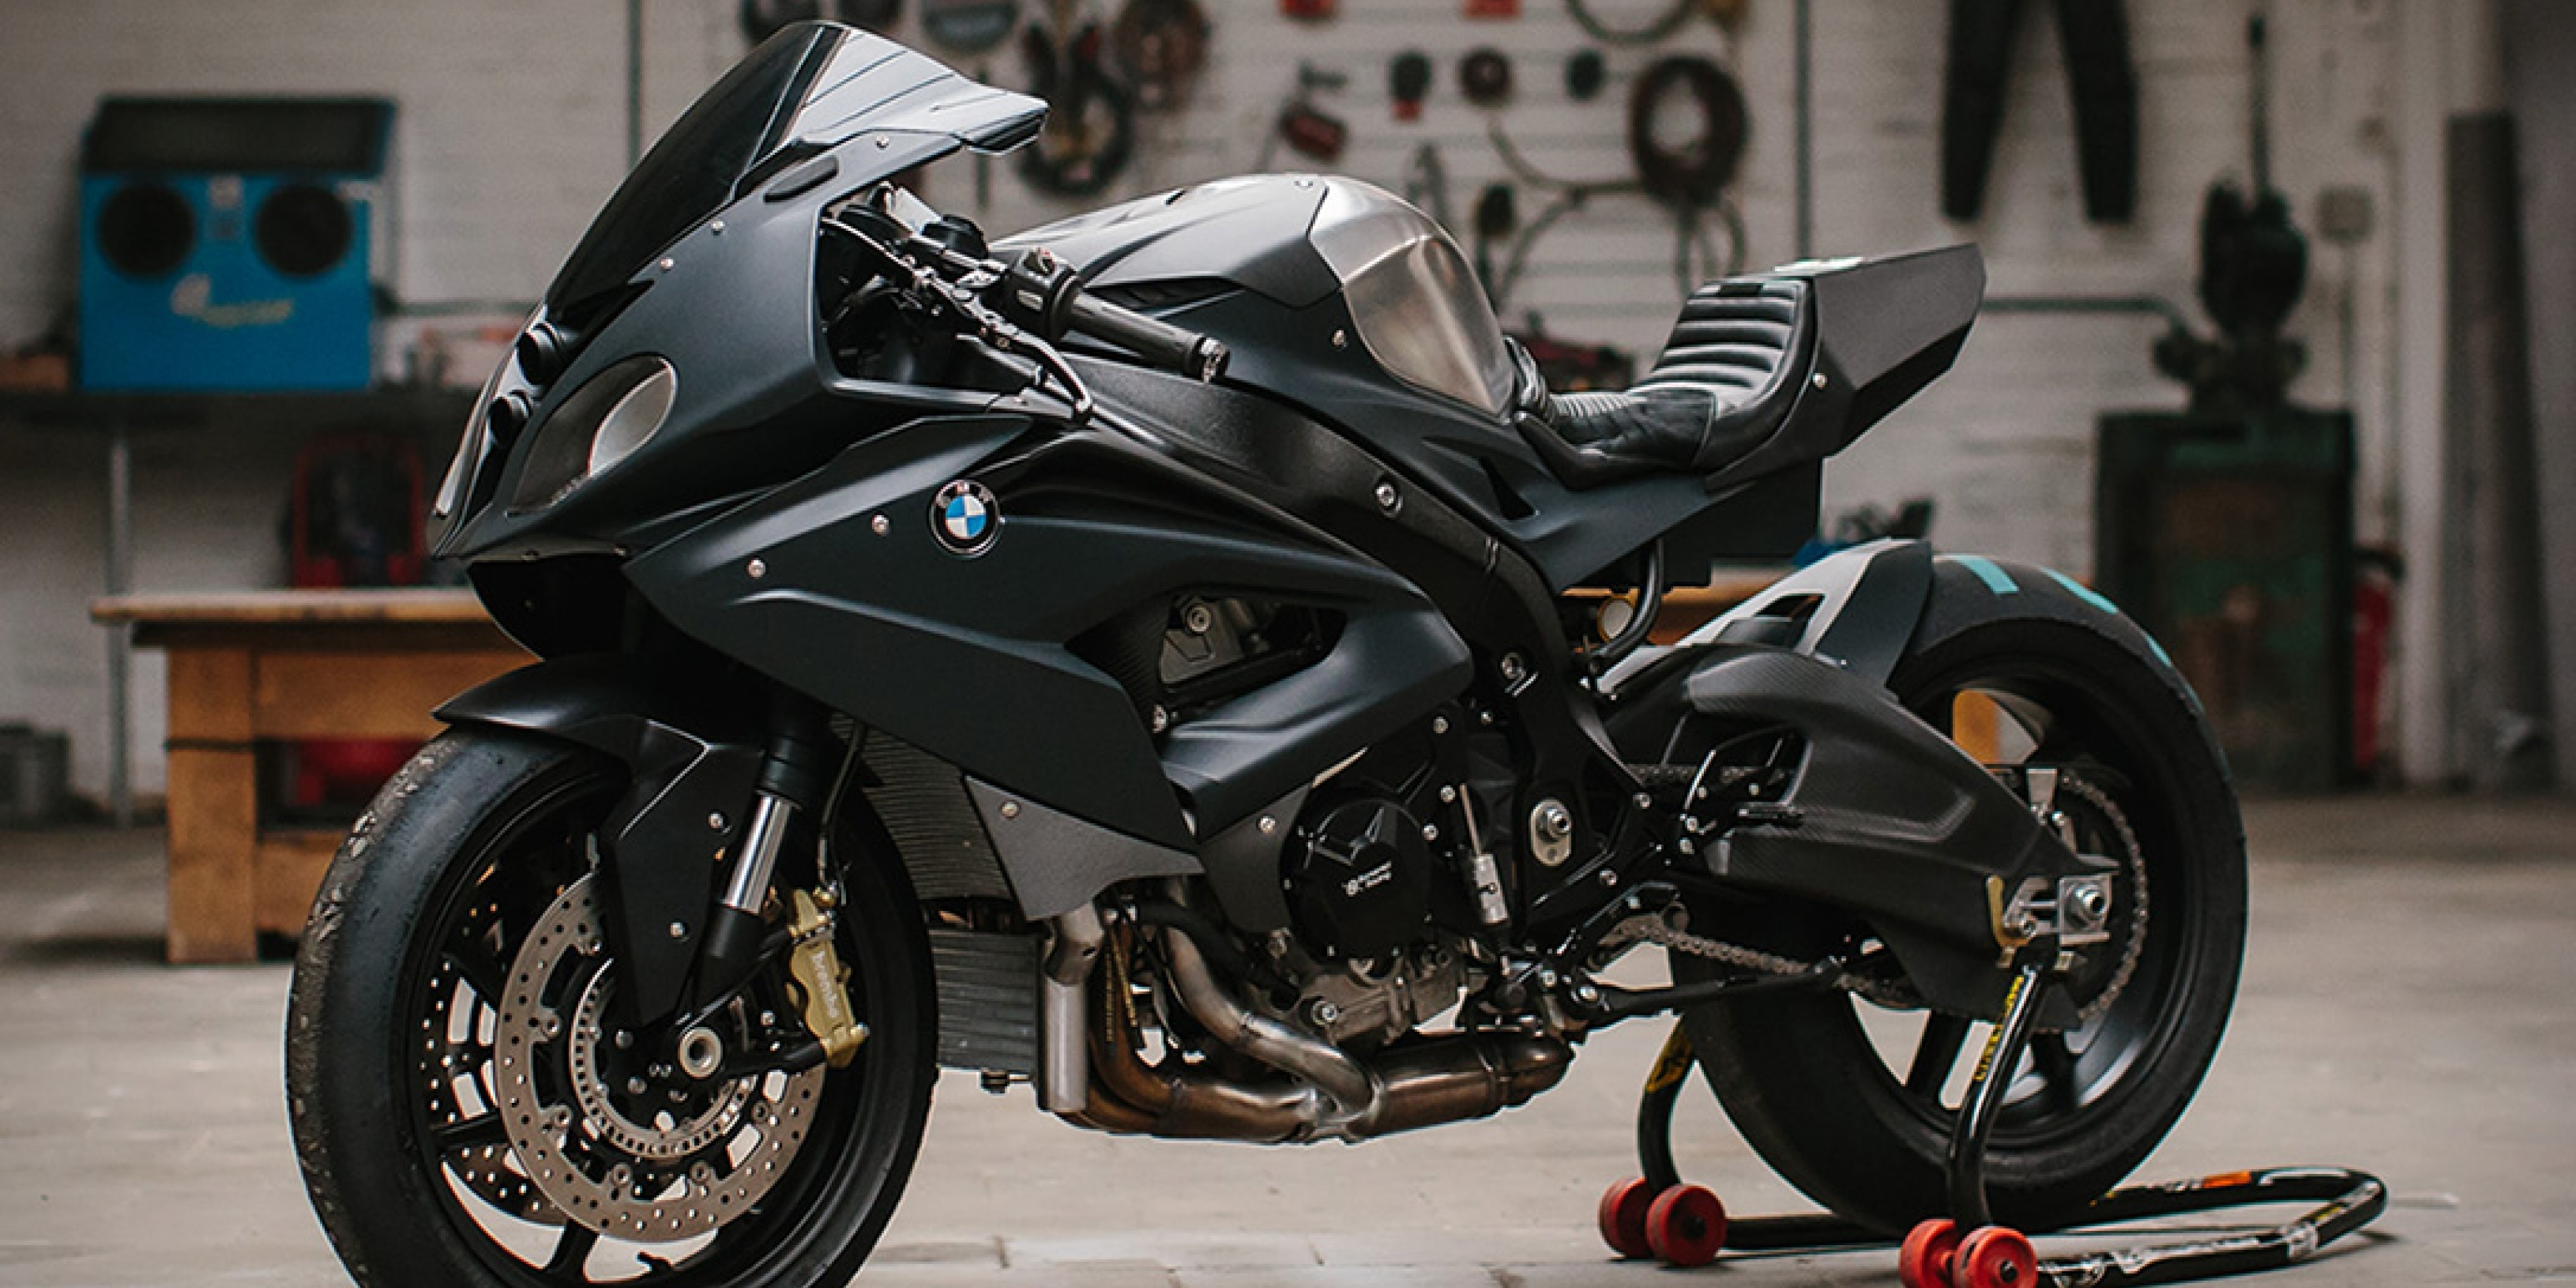 挑戰300匹馬力!BMW S 1000RR TURBO